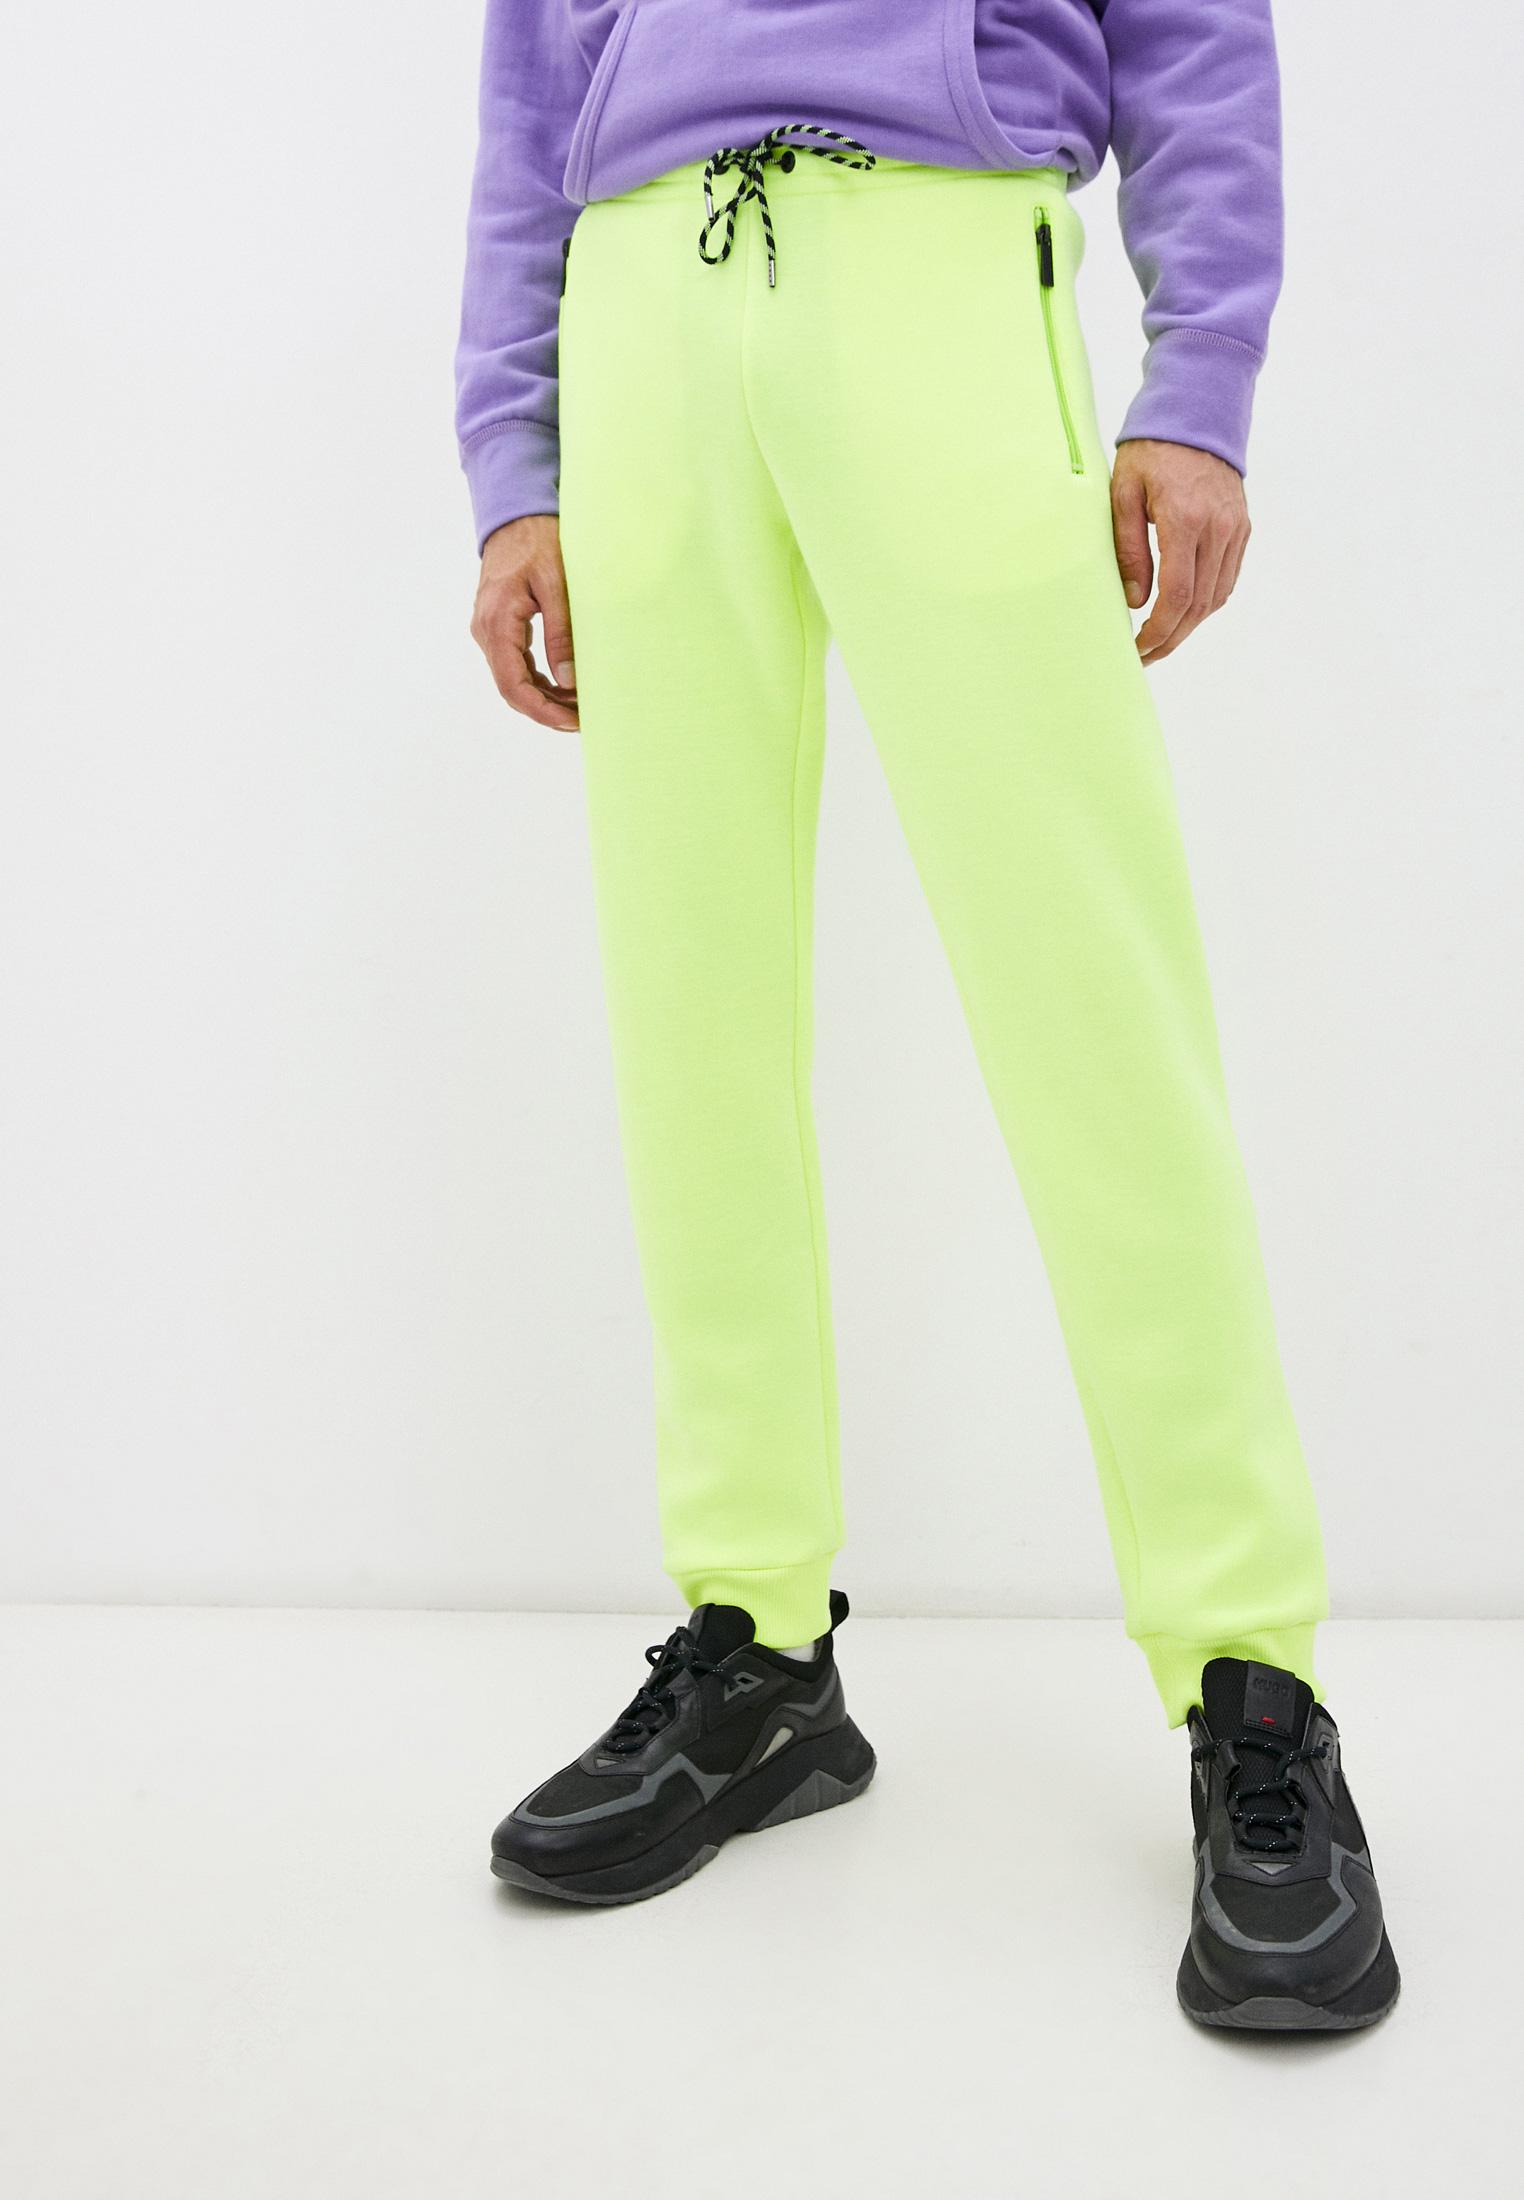 Мужские спортивные брюки Bikkembergs (Биккембергс) C 1 096 9E M 4119: изображение 1